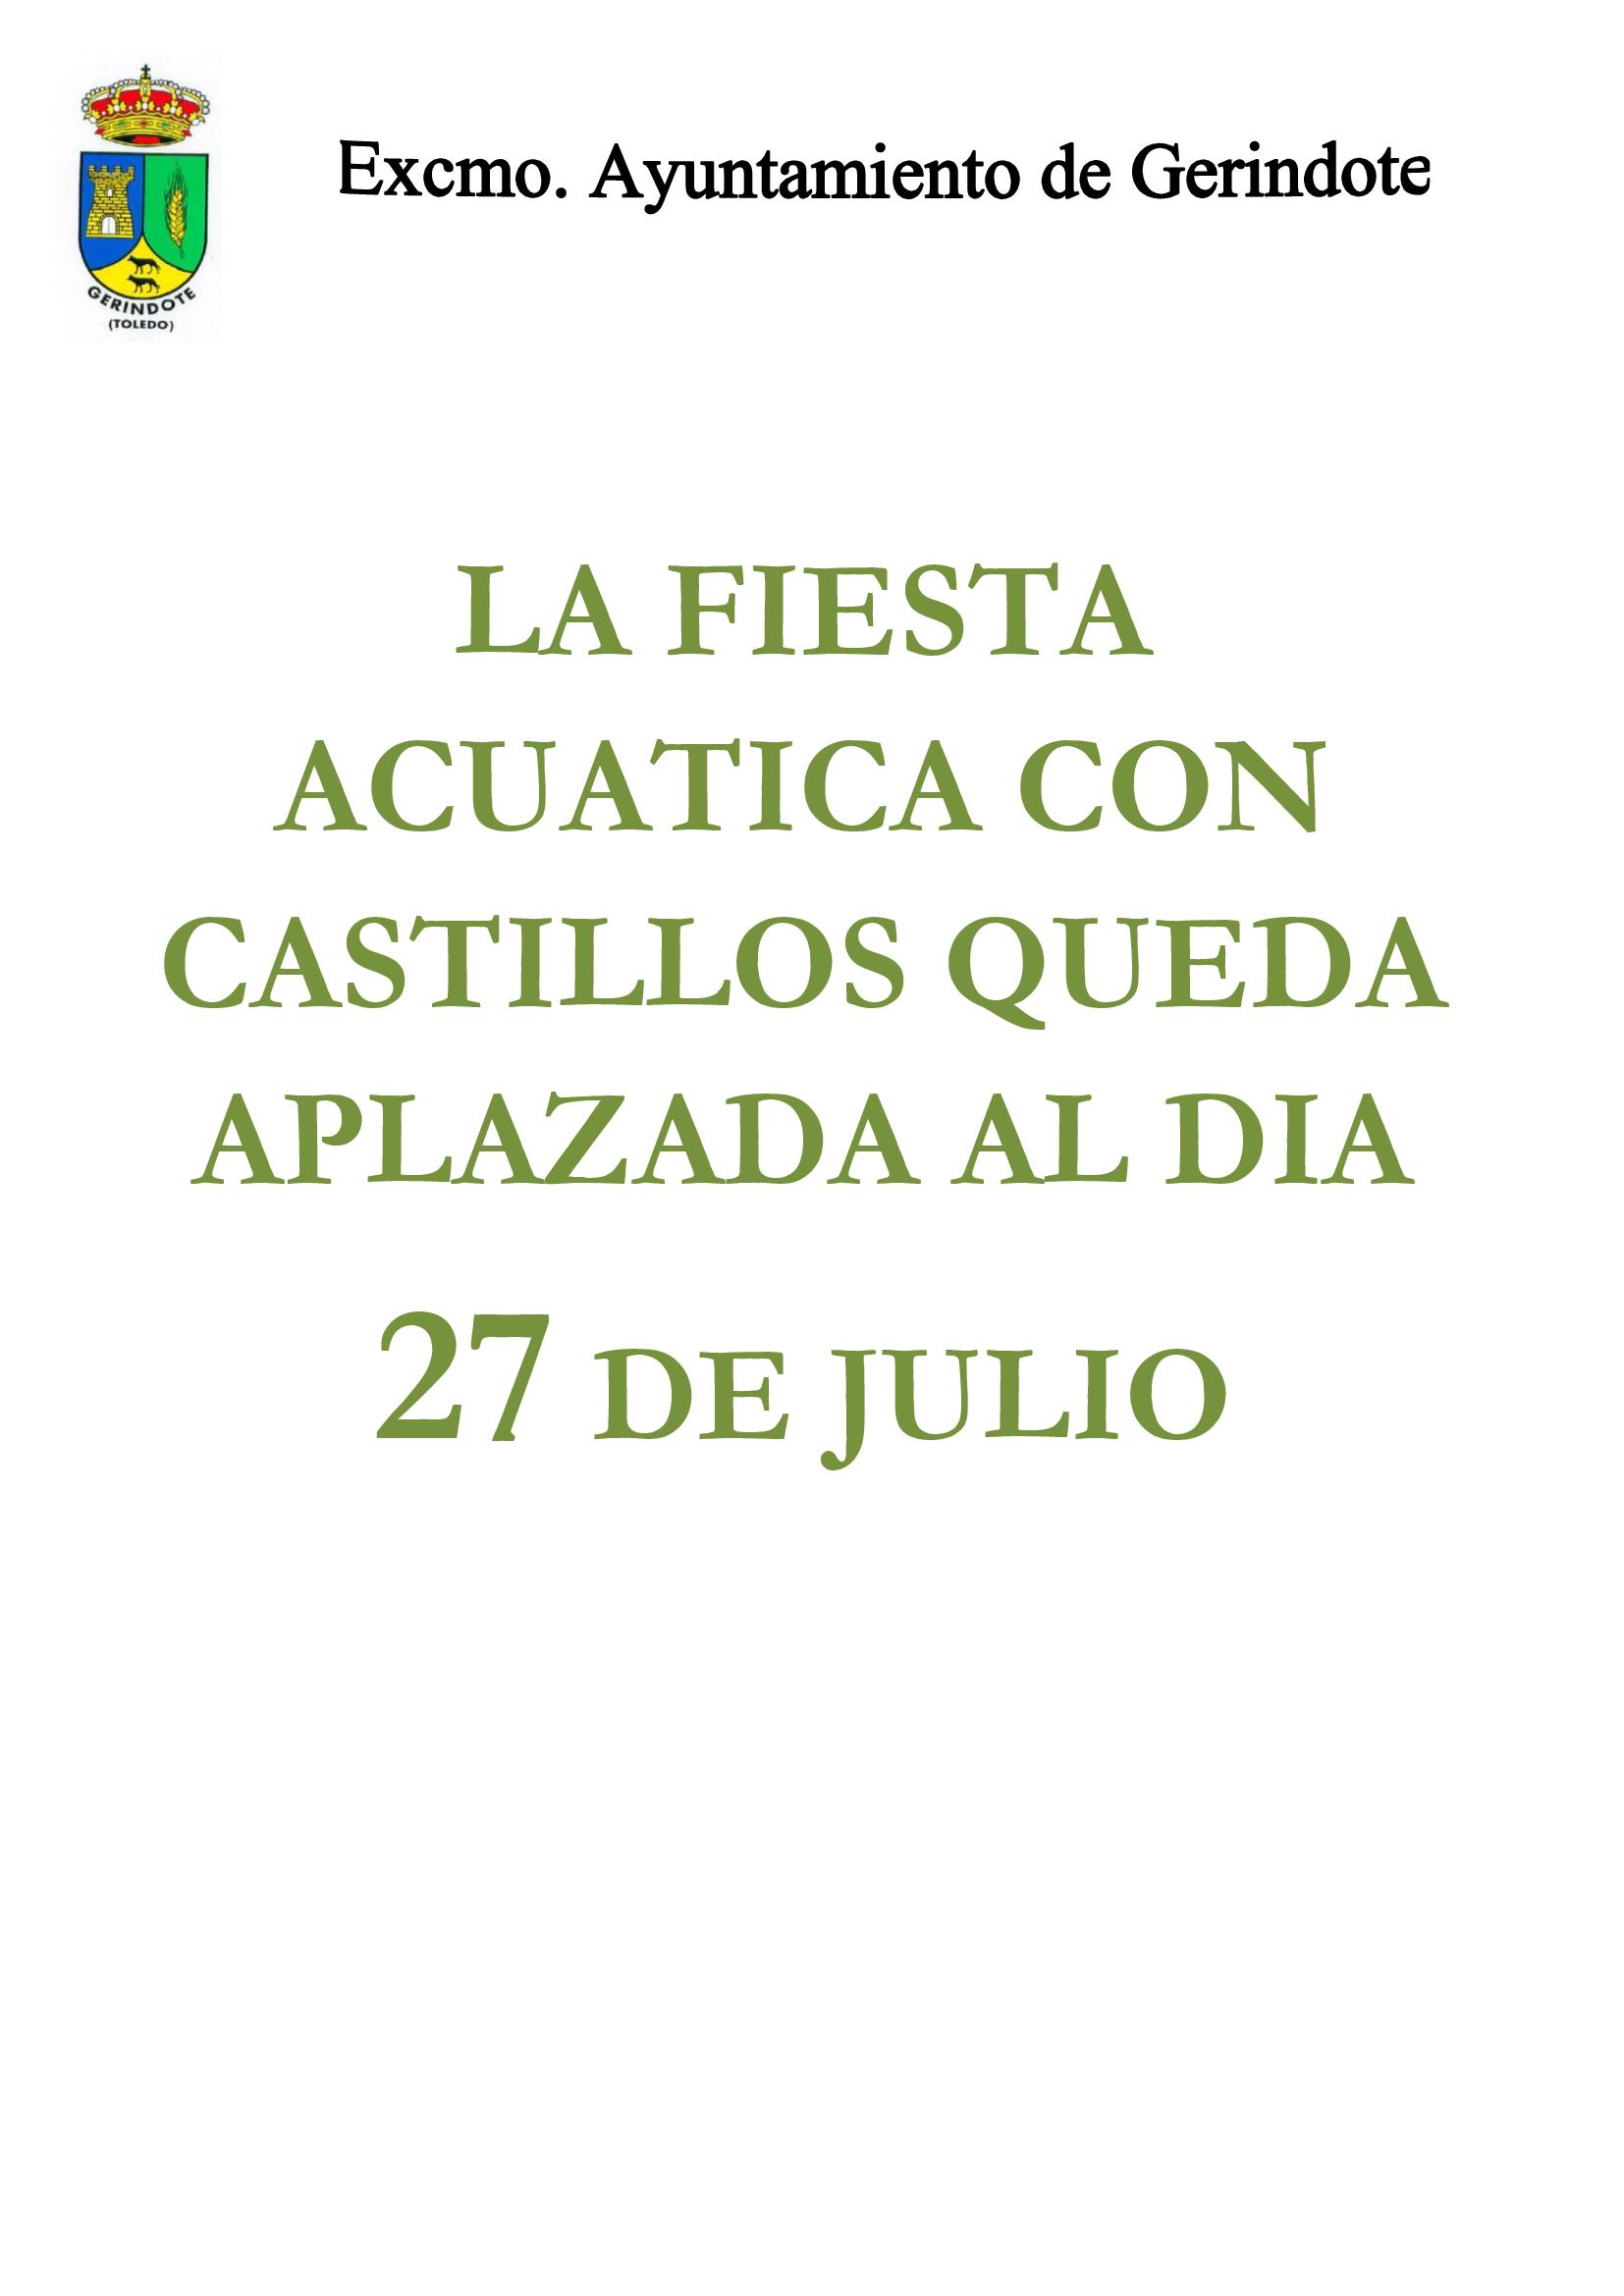 CARTEL-APLAZADO-FIESTA-ACUATICA.jpg